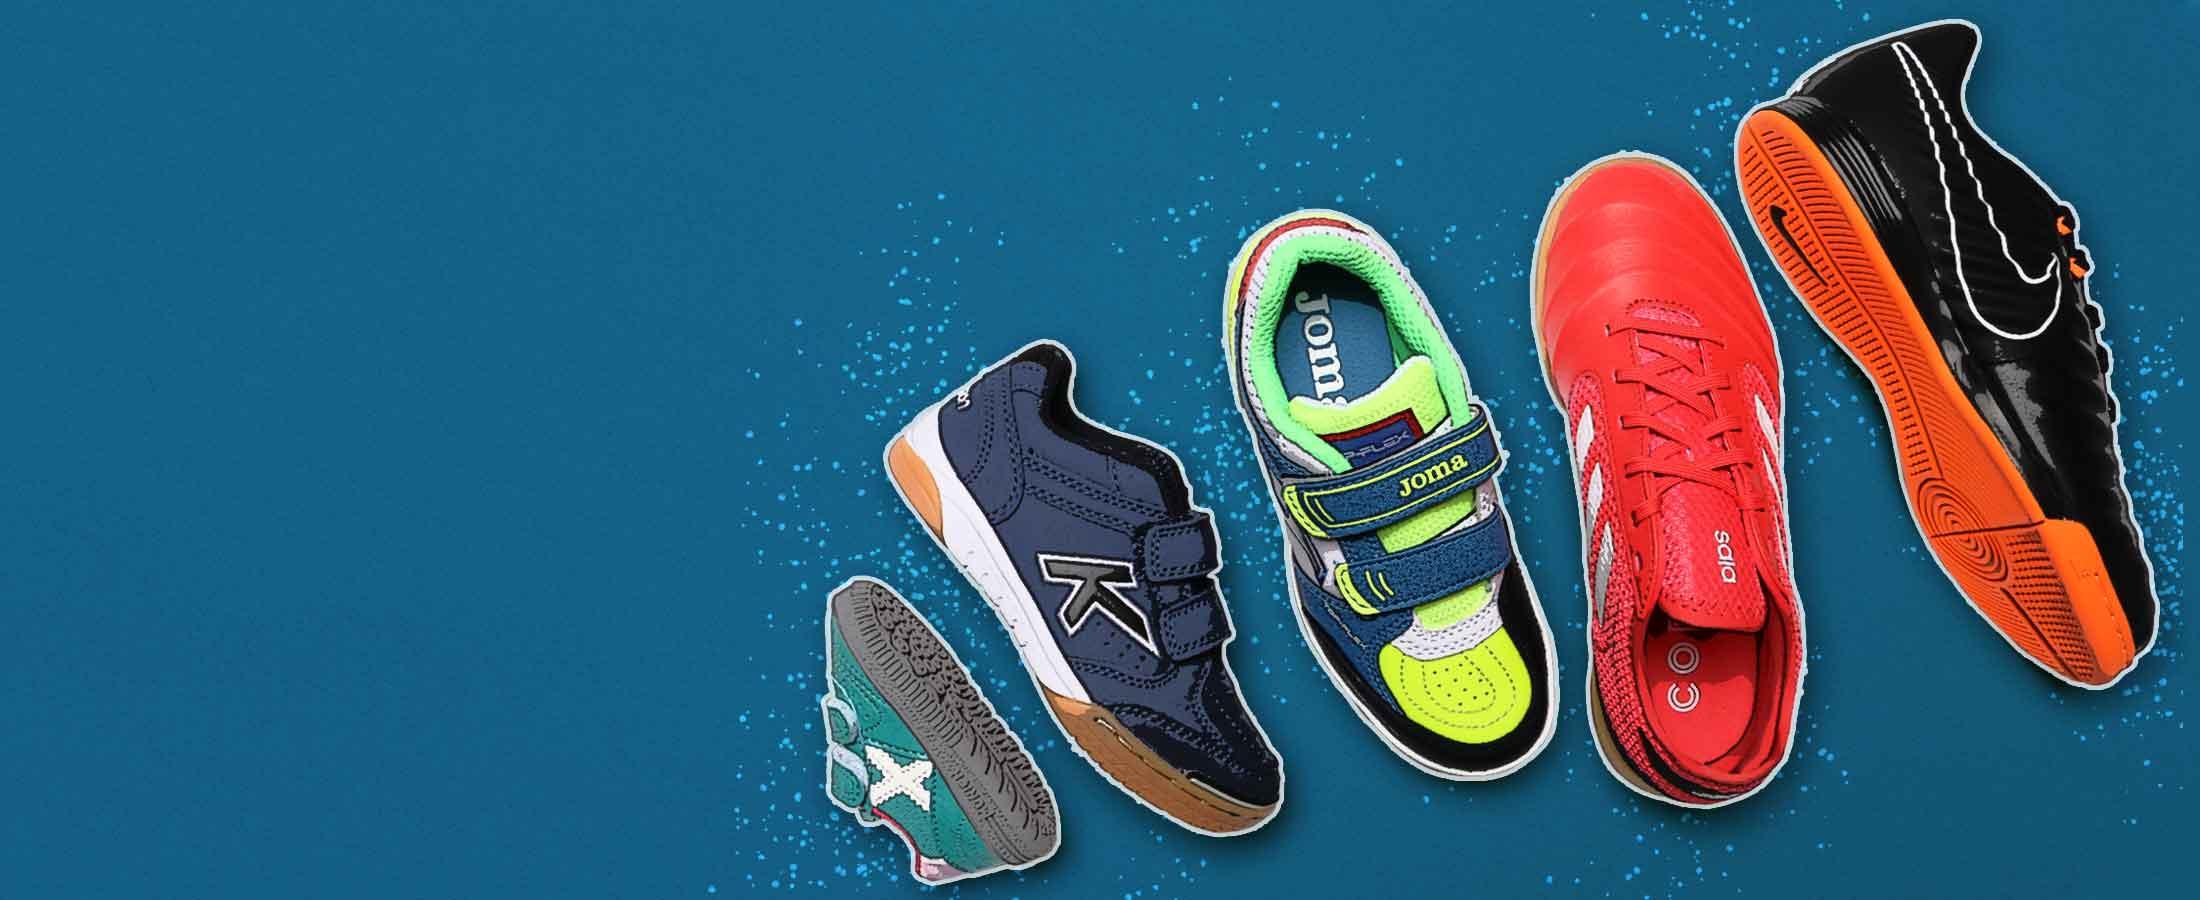 Zapatillas de fútbol sala para niño de distintas tallas sobre fondo azul